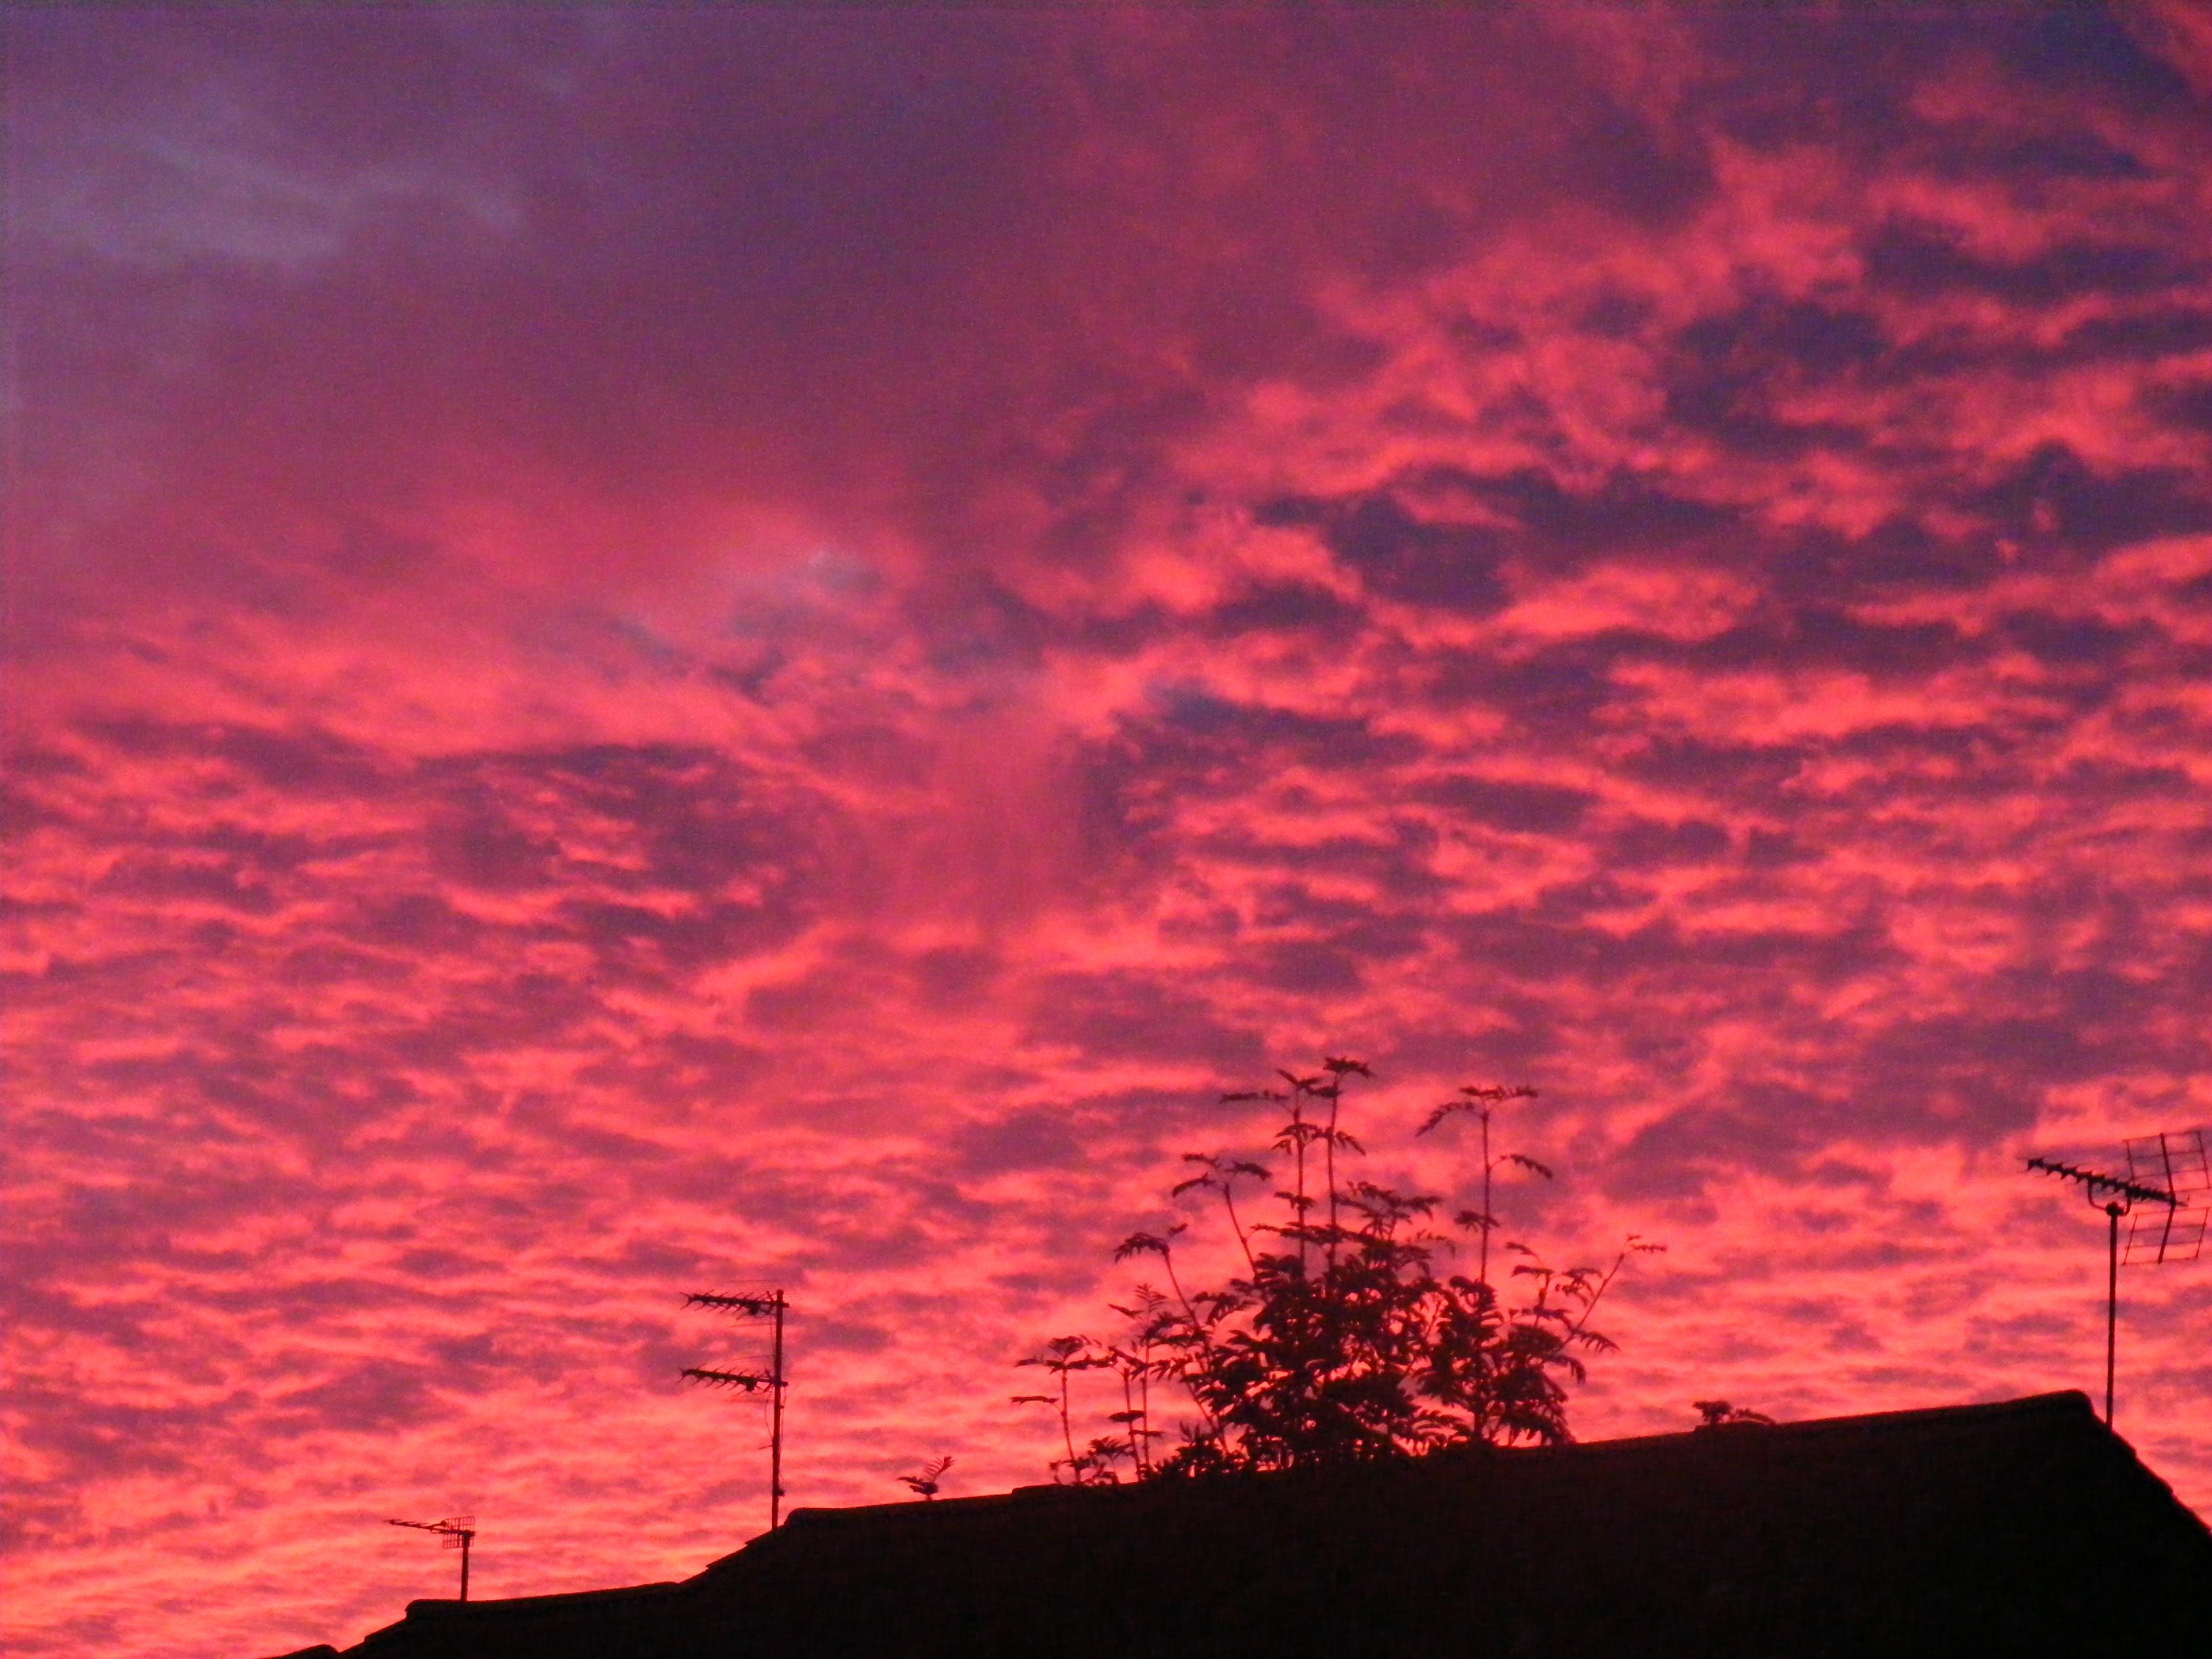 The Sea Night Orange Sunset 3264x2448